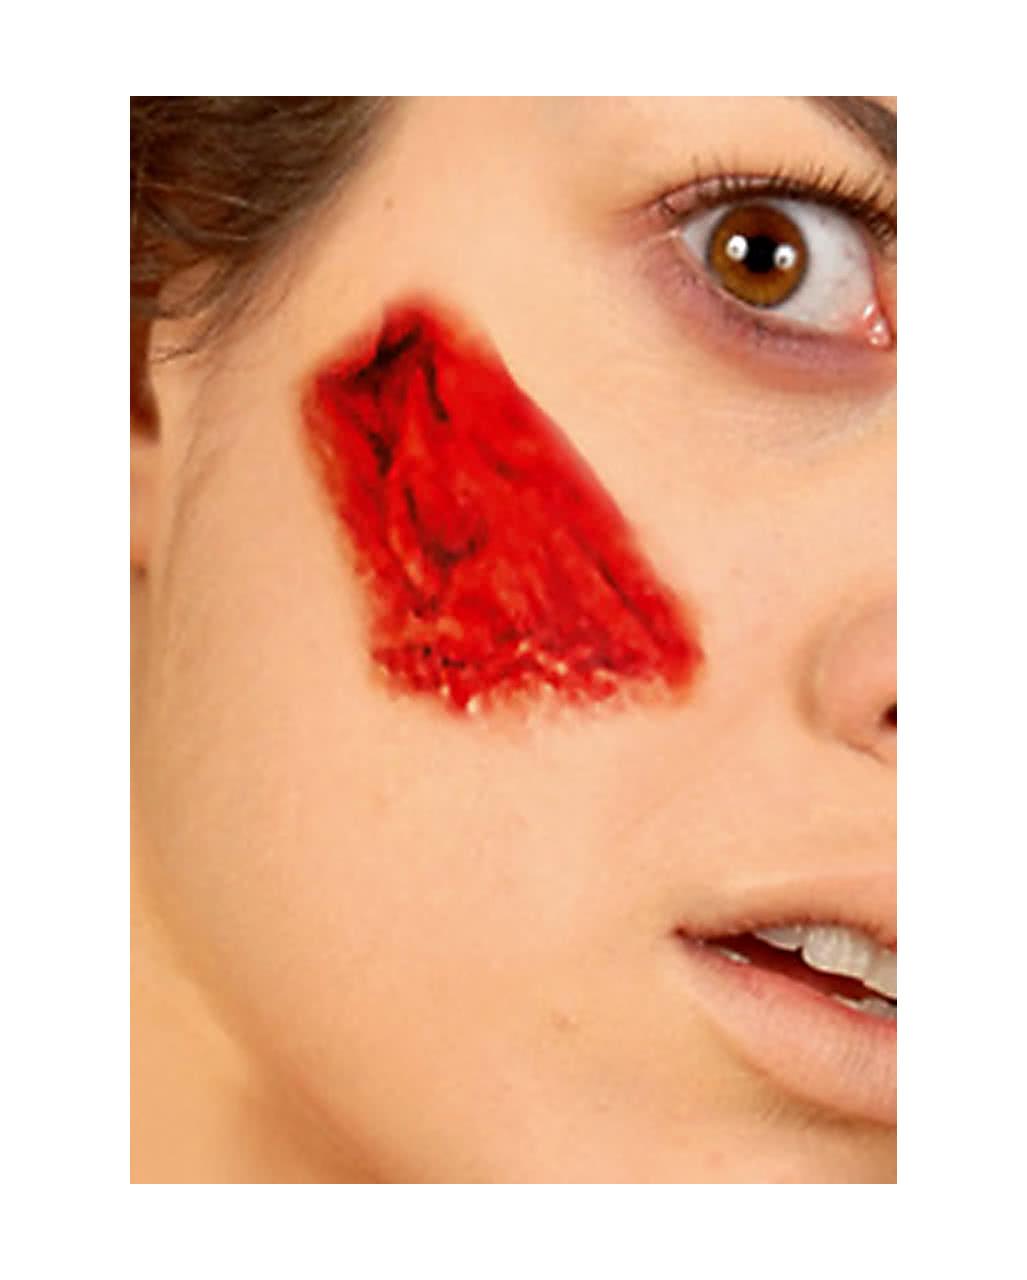 Tattoo fabric wound 7 halloween makeup horror for Halloween makeup tattoos